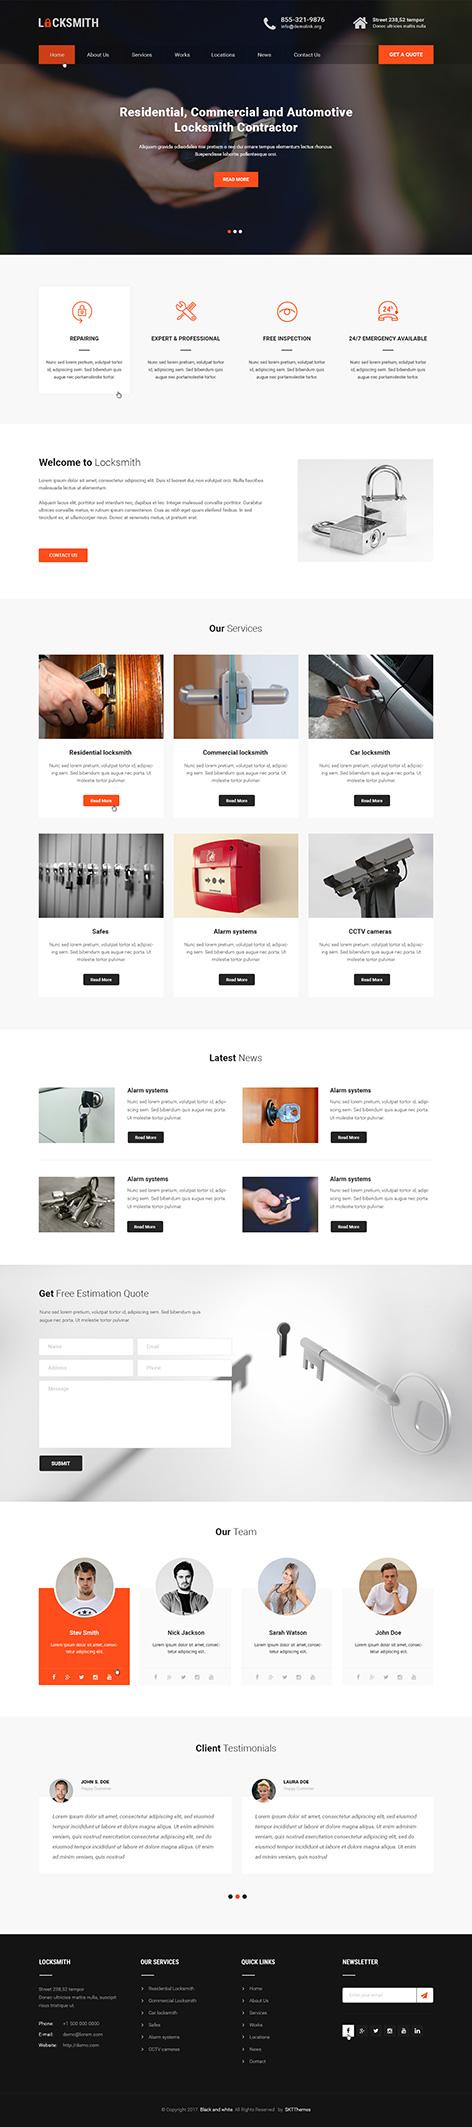 locksmith wordpress theme1 2 - Locksmith